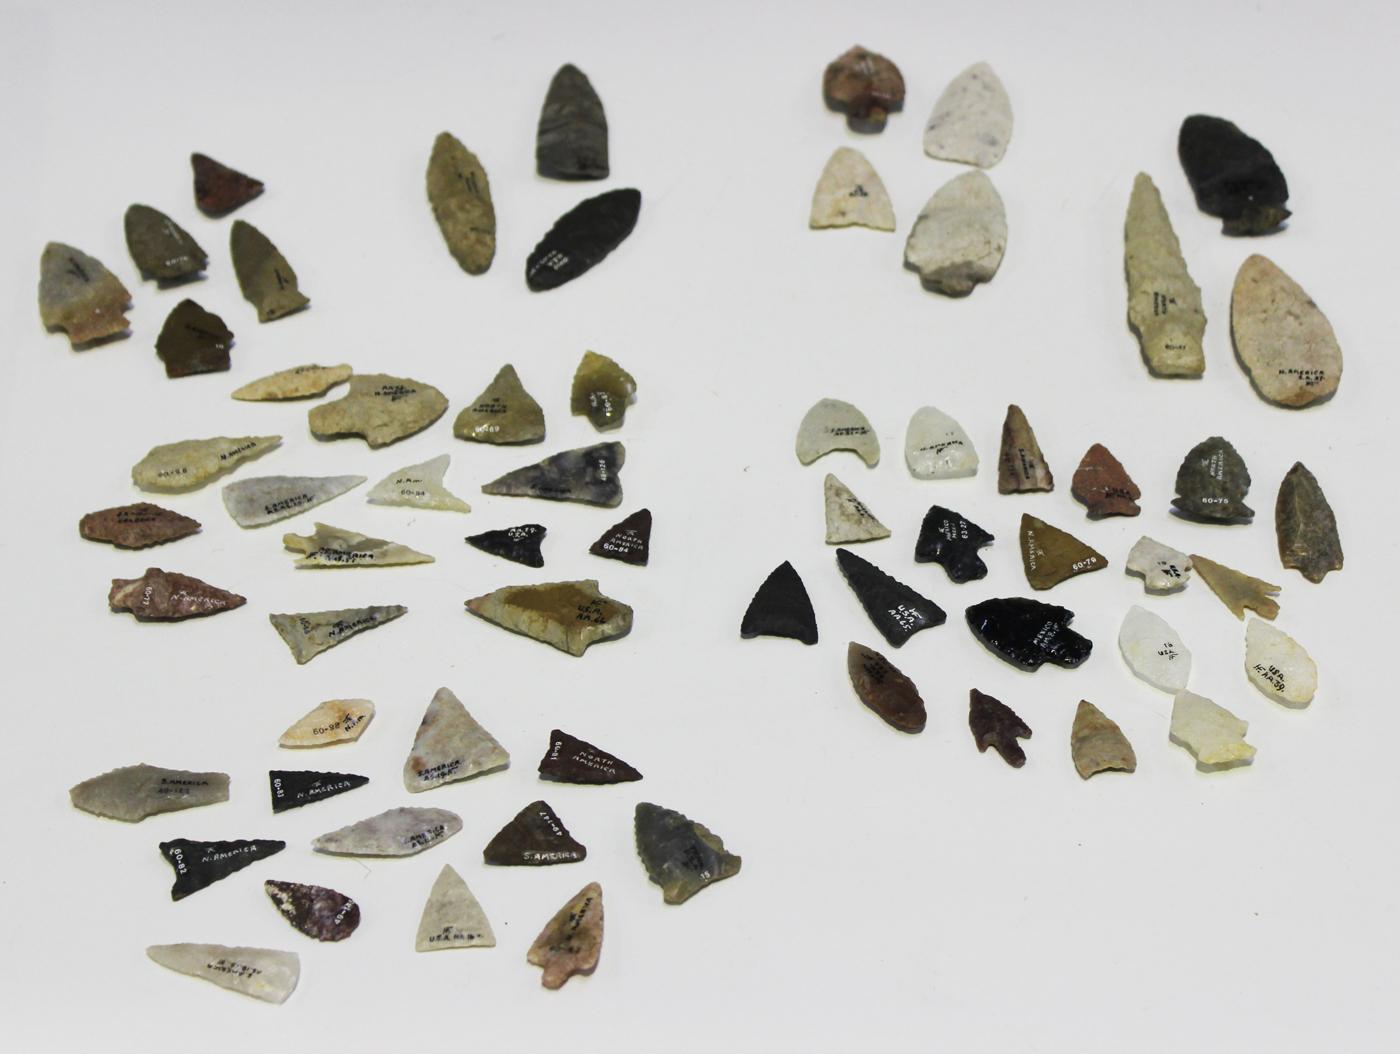 Dating obsidian arrowheads definition